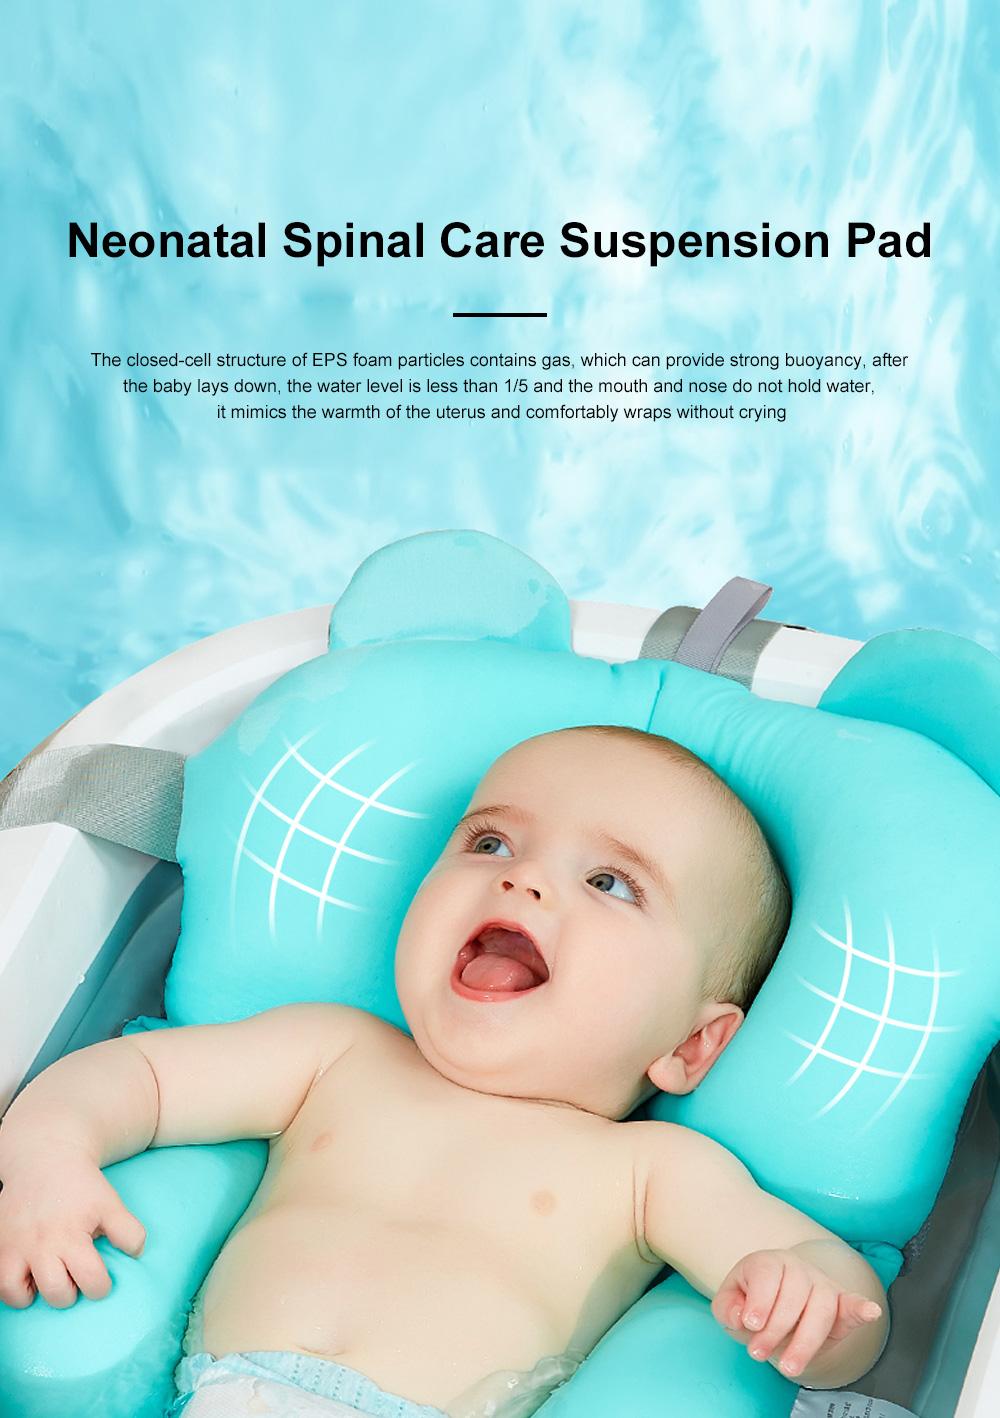 Portable Folding Baby Bath Tub Anti-Slip Bottom Non-Toxic Material Children Bathtub Bucket For Baby within 5 Year Old 2